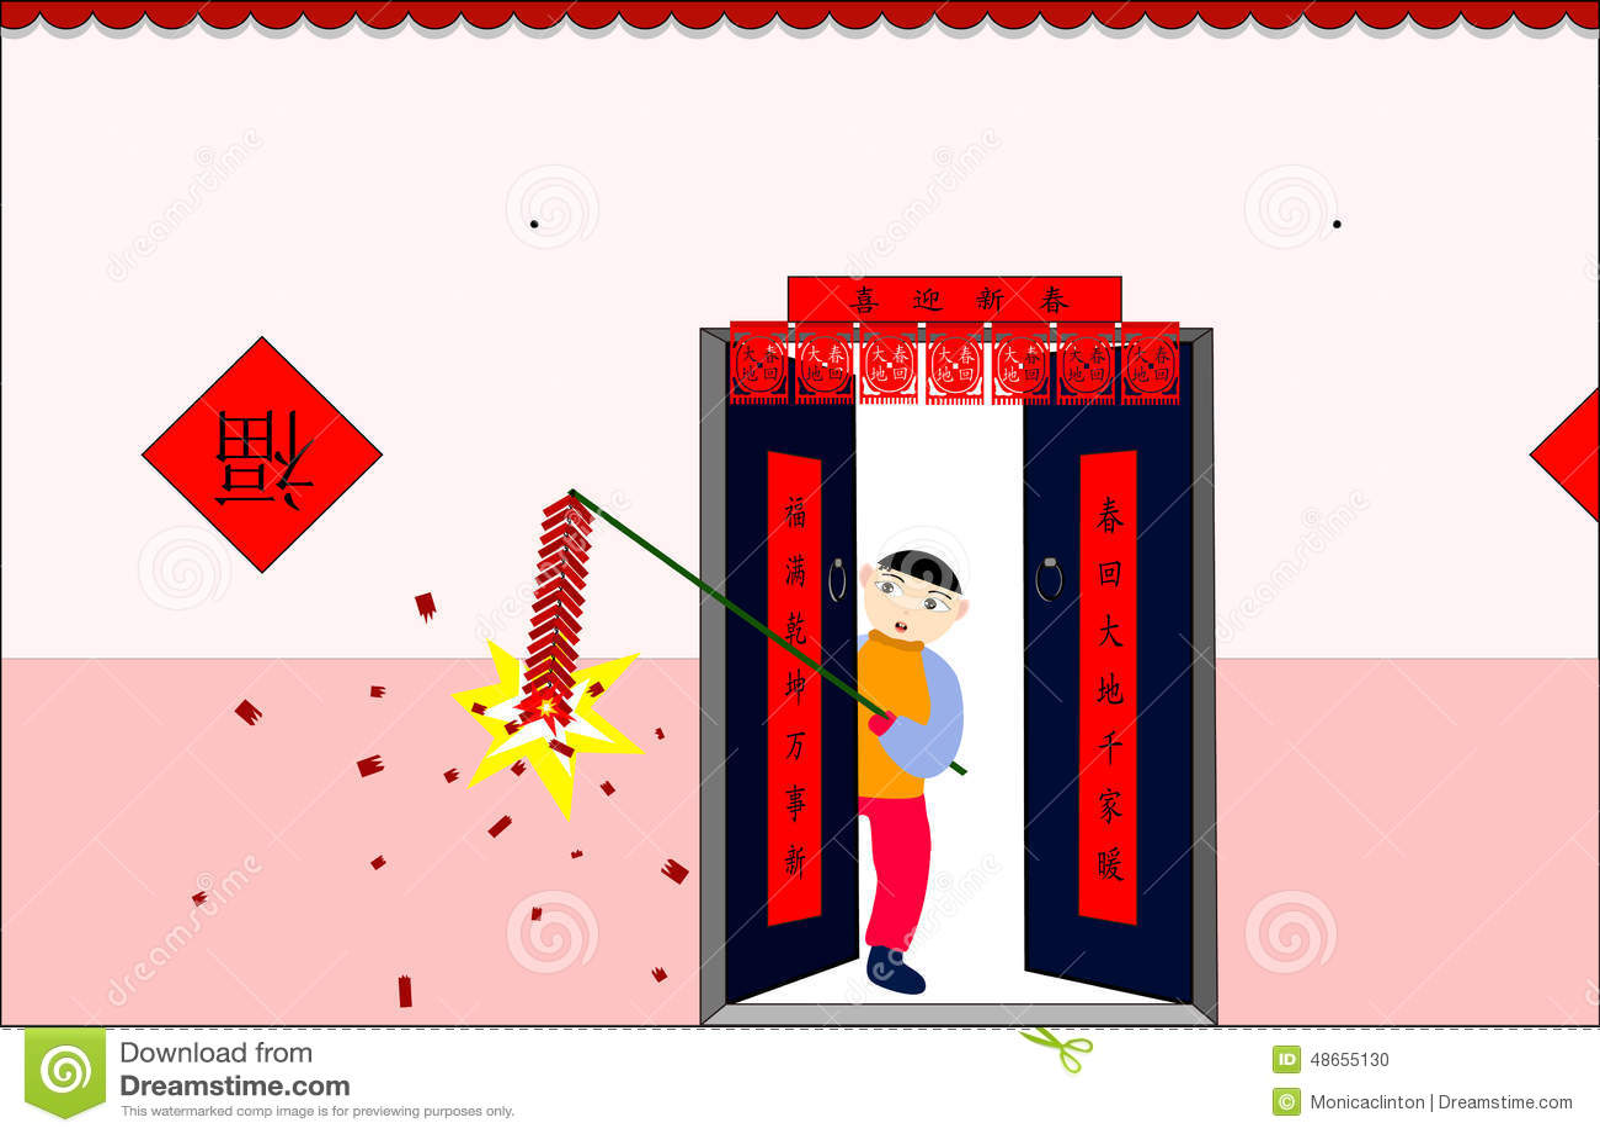 chinese new year custom - Chinese New Year Customs